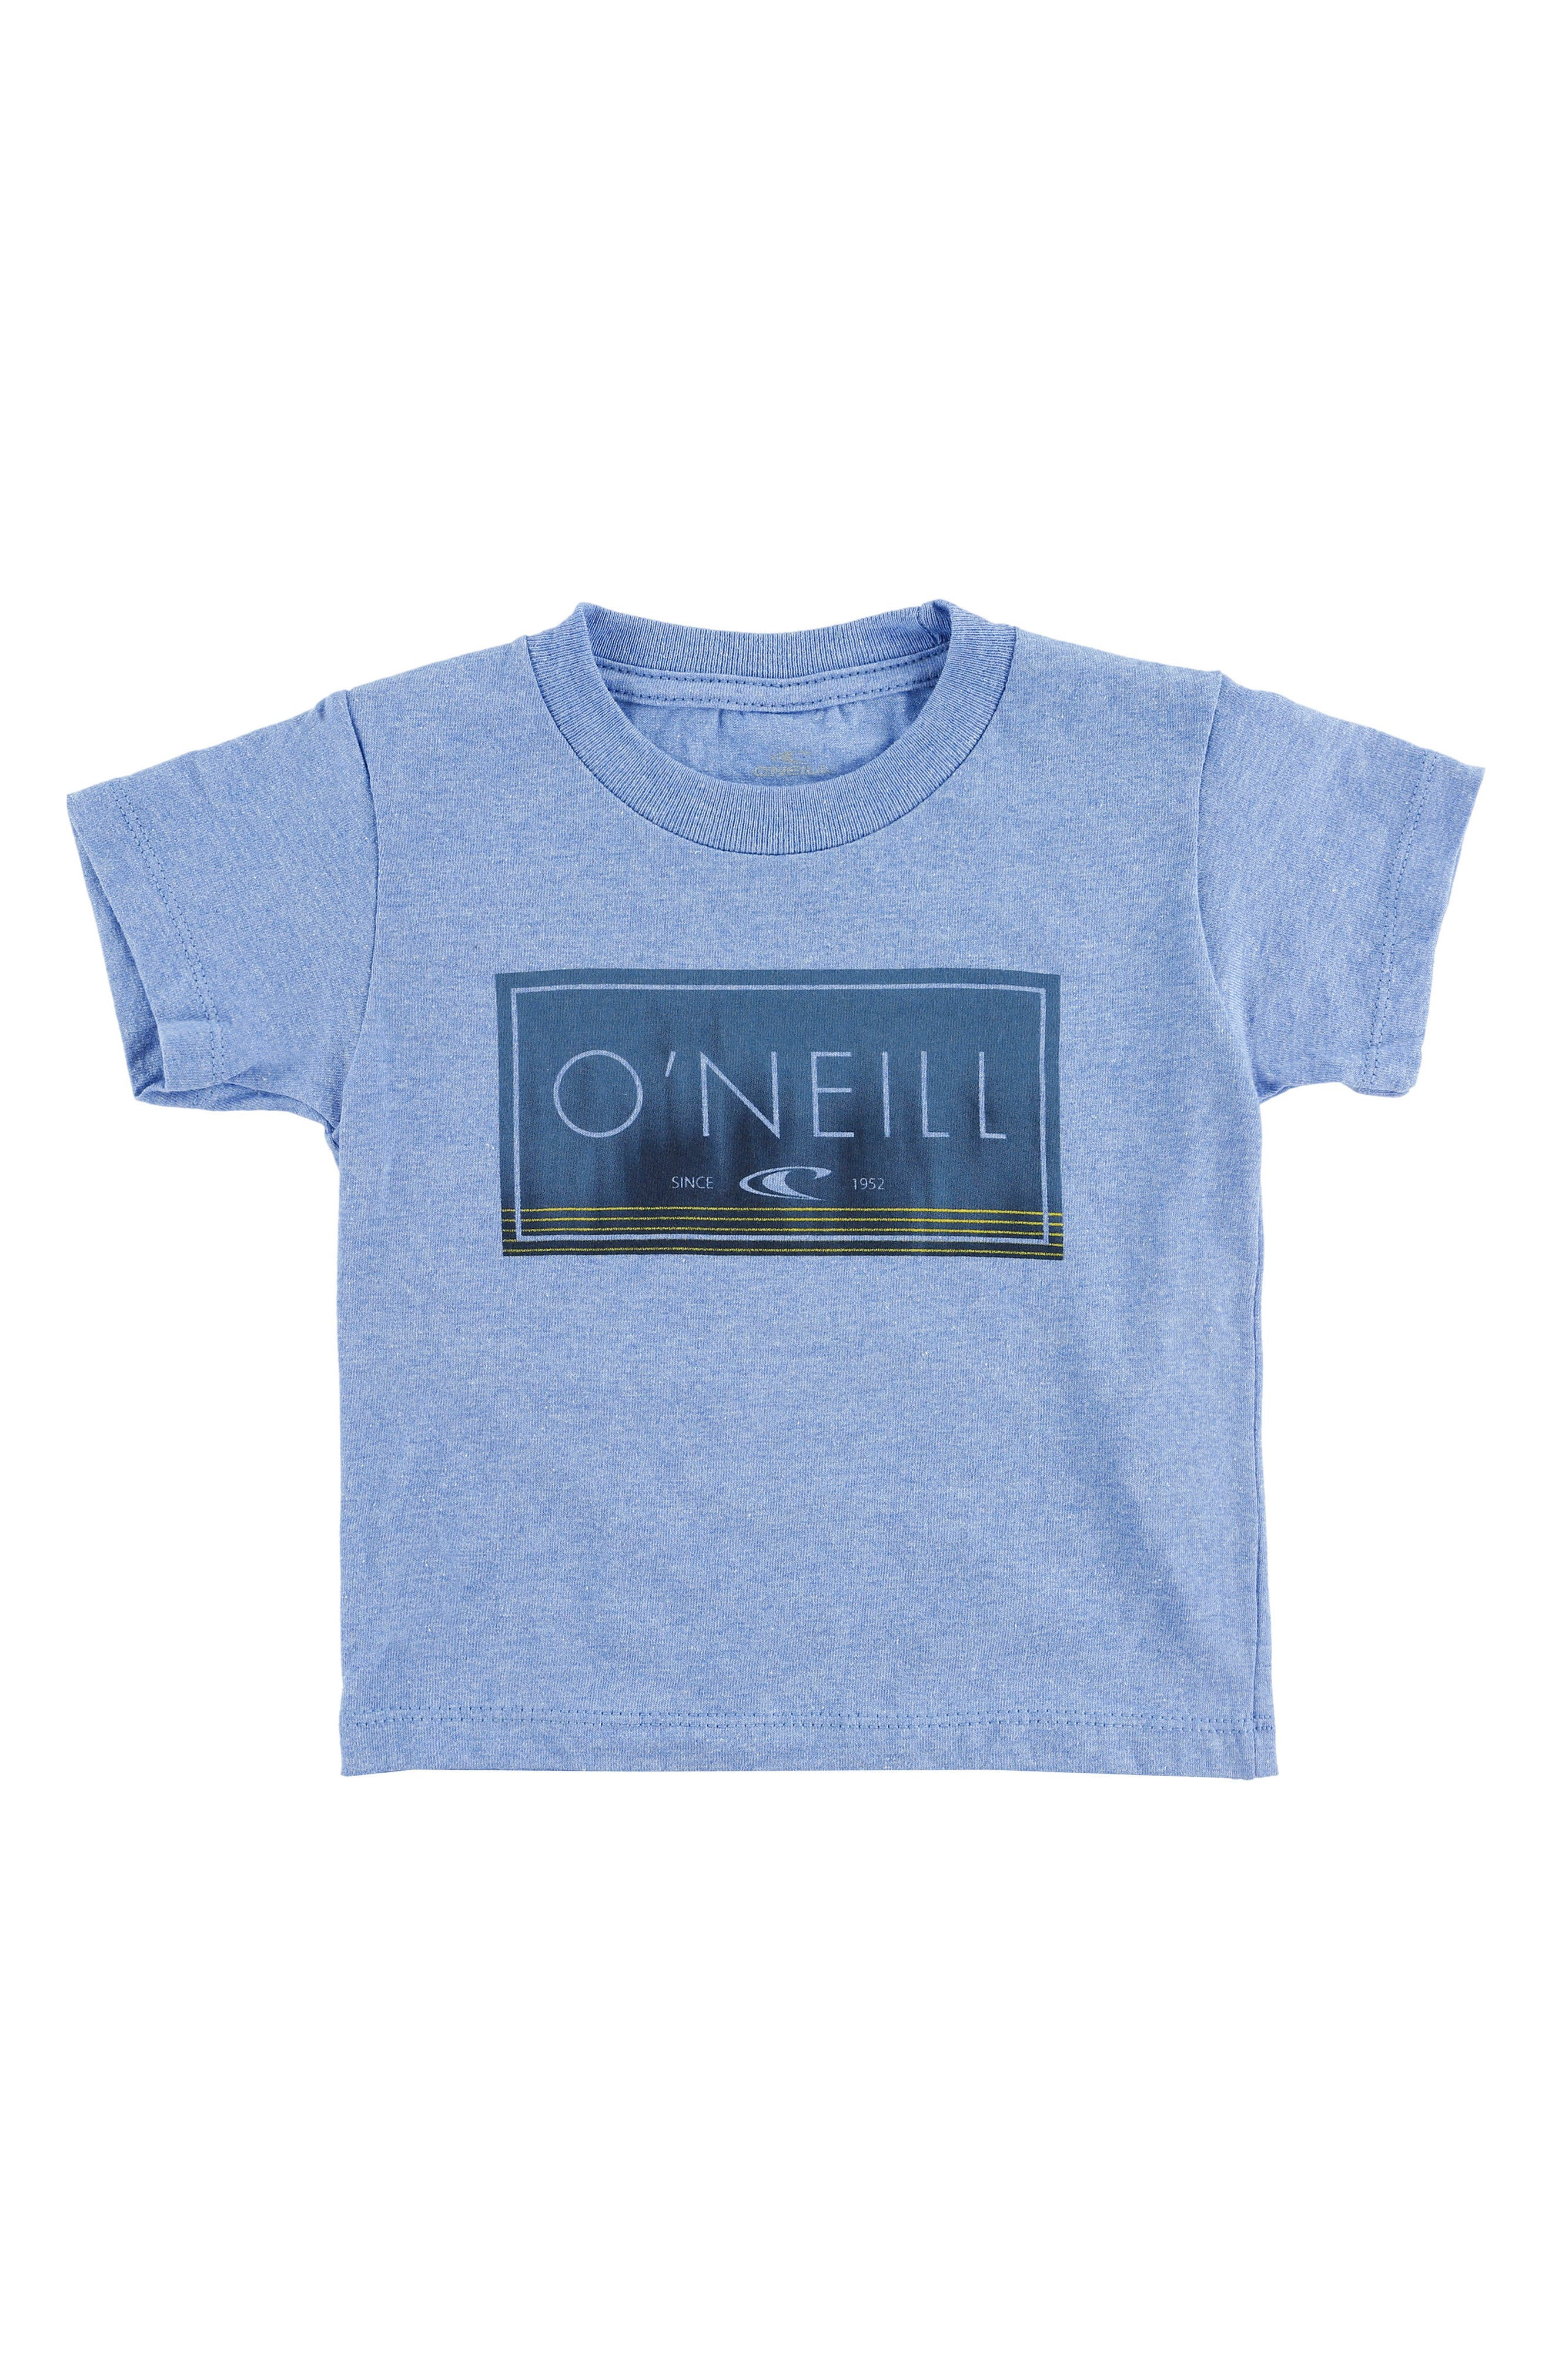 Arts Graphic T-Shirt,                         Main,                         color, Heather Light Blue